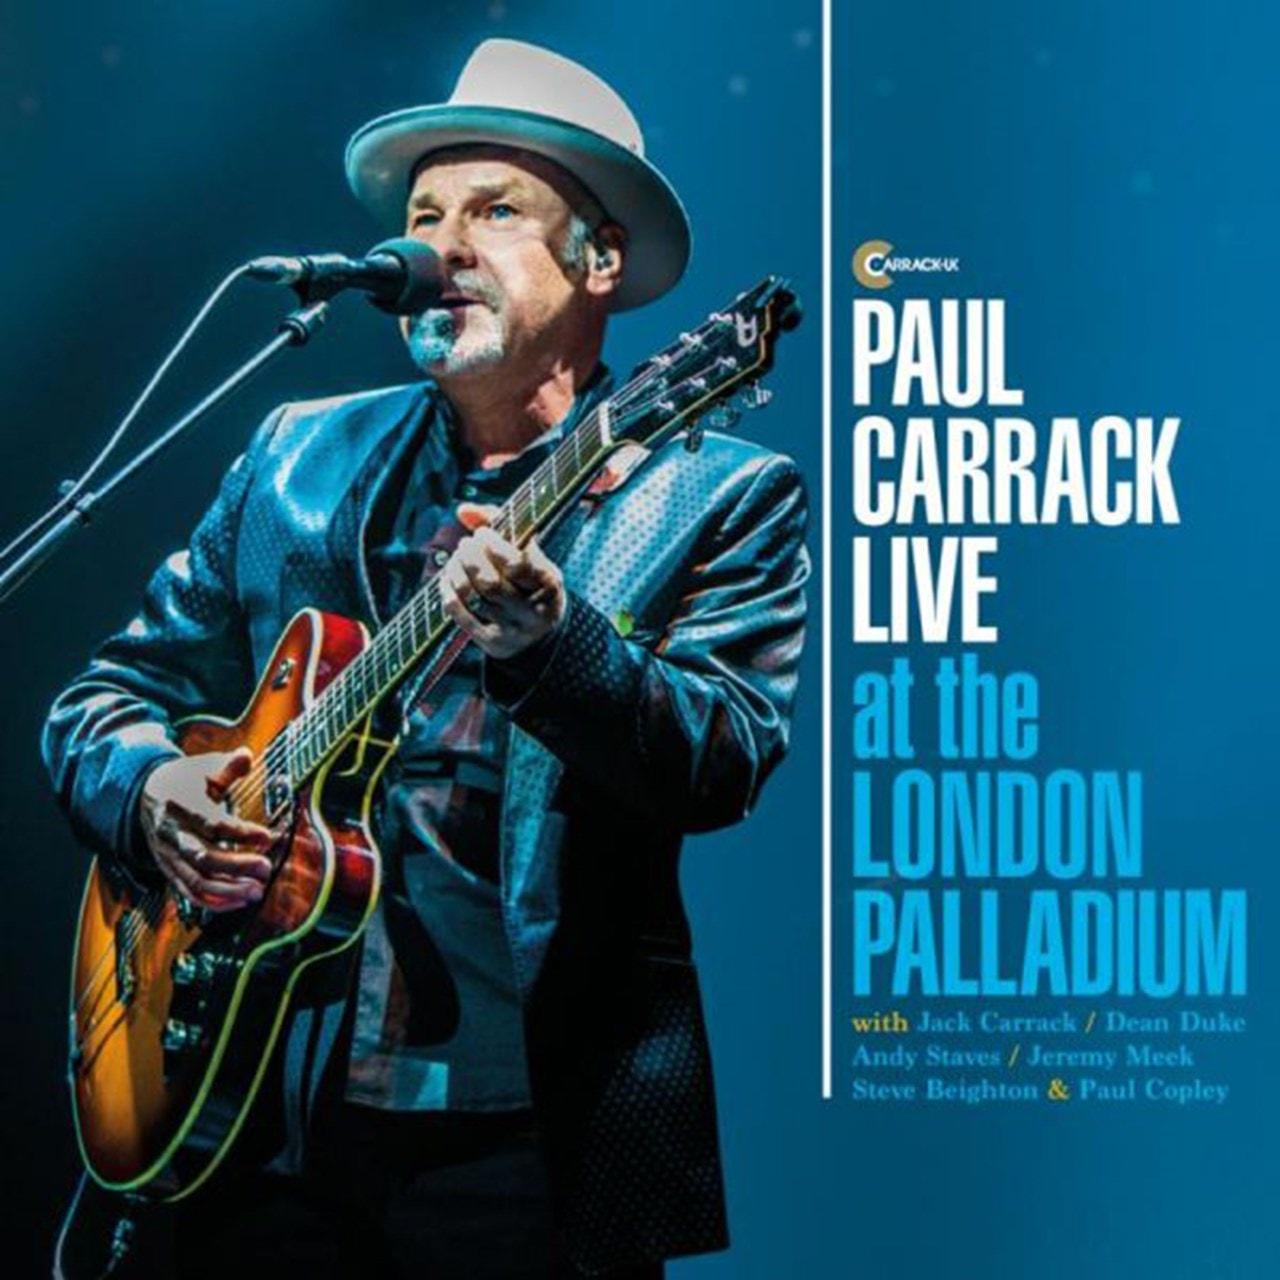 Live at the London Palladium - 1